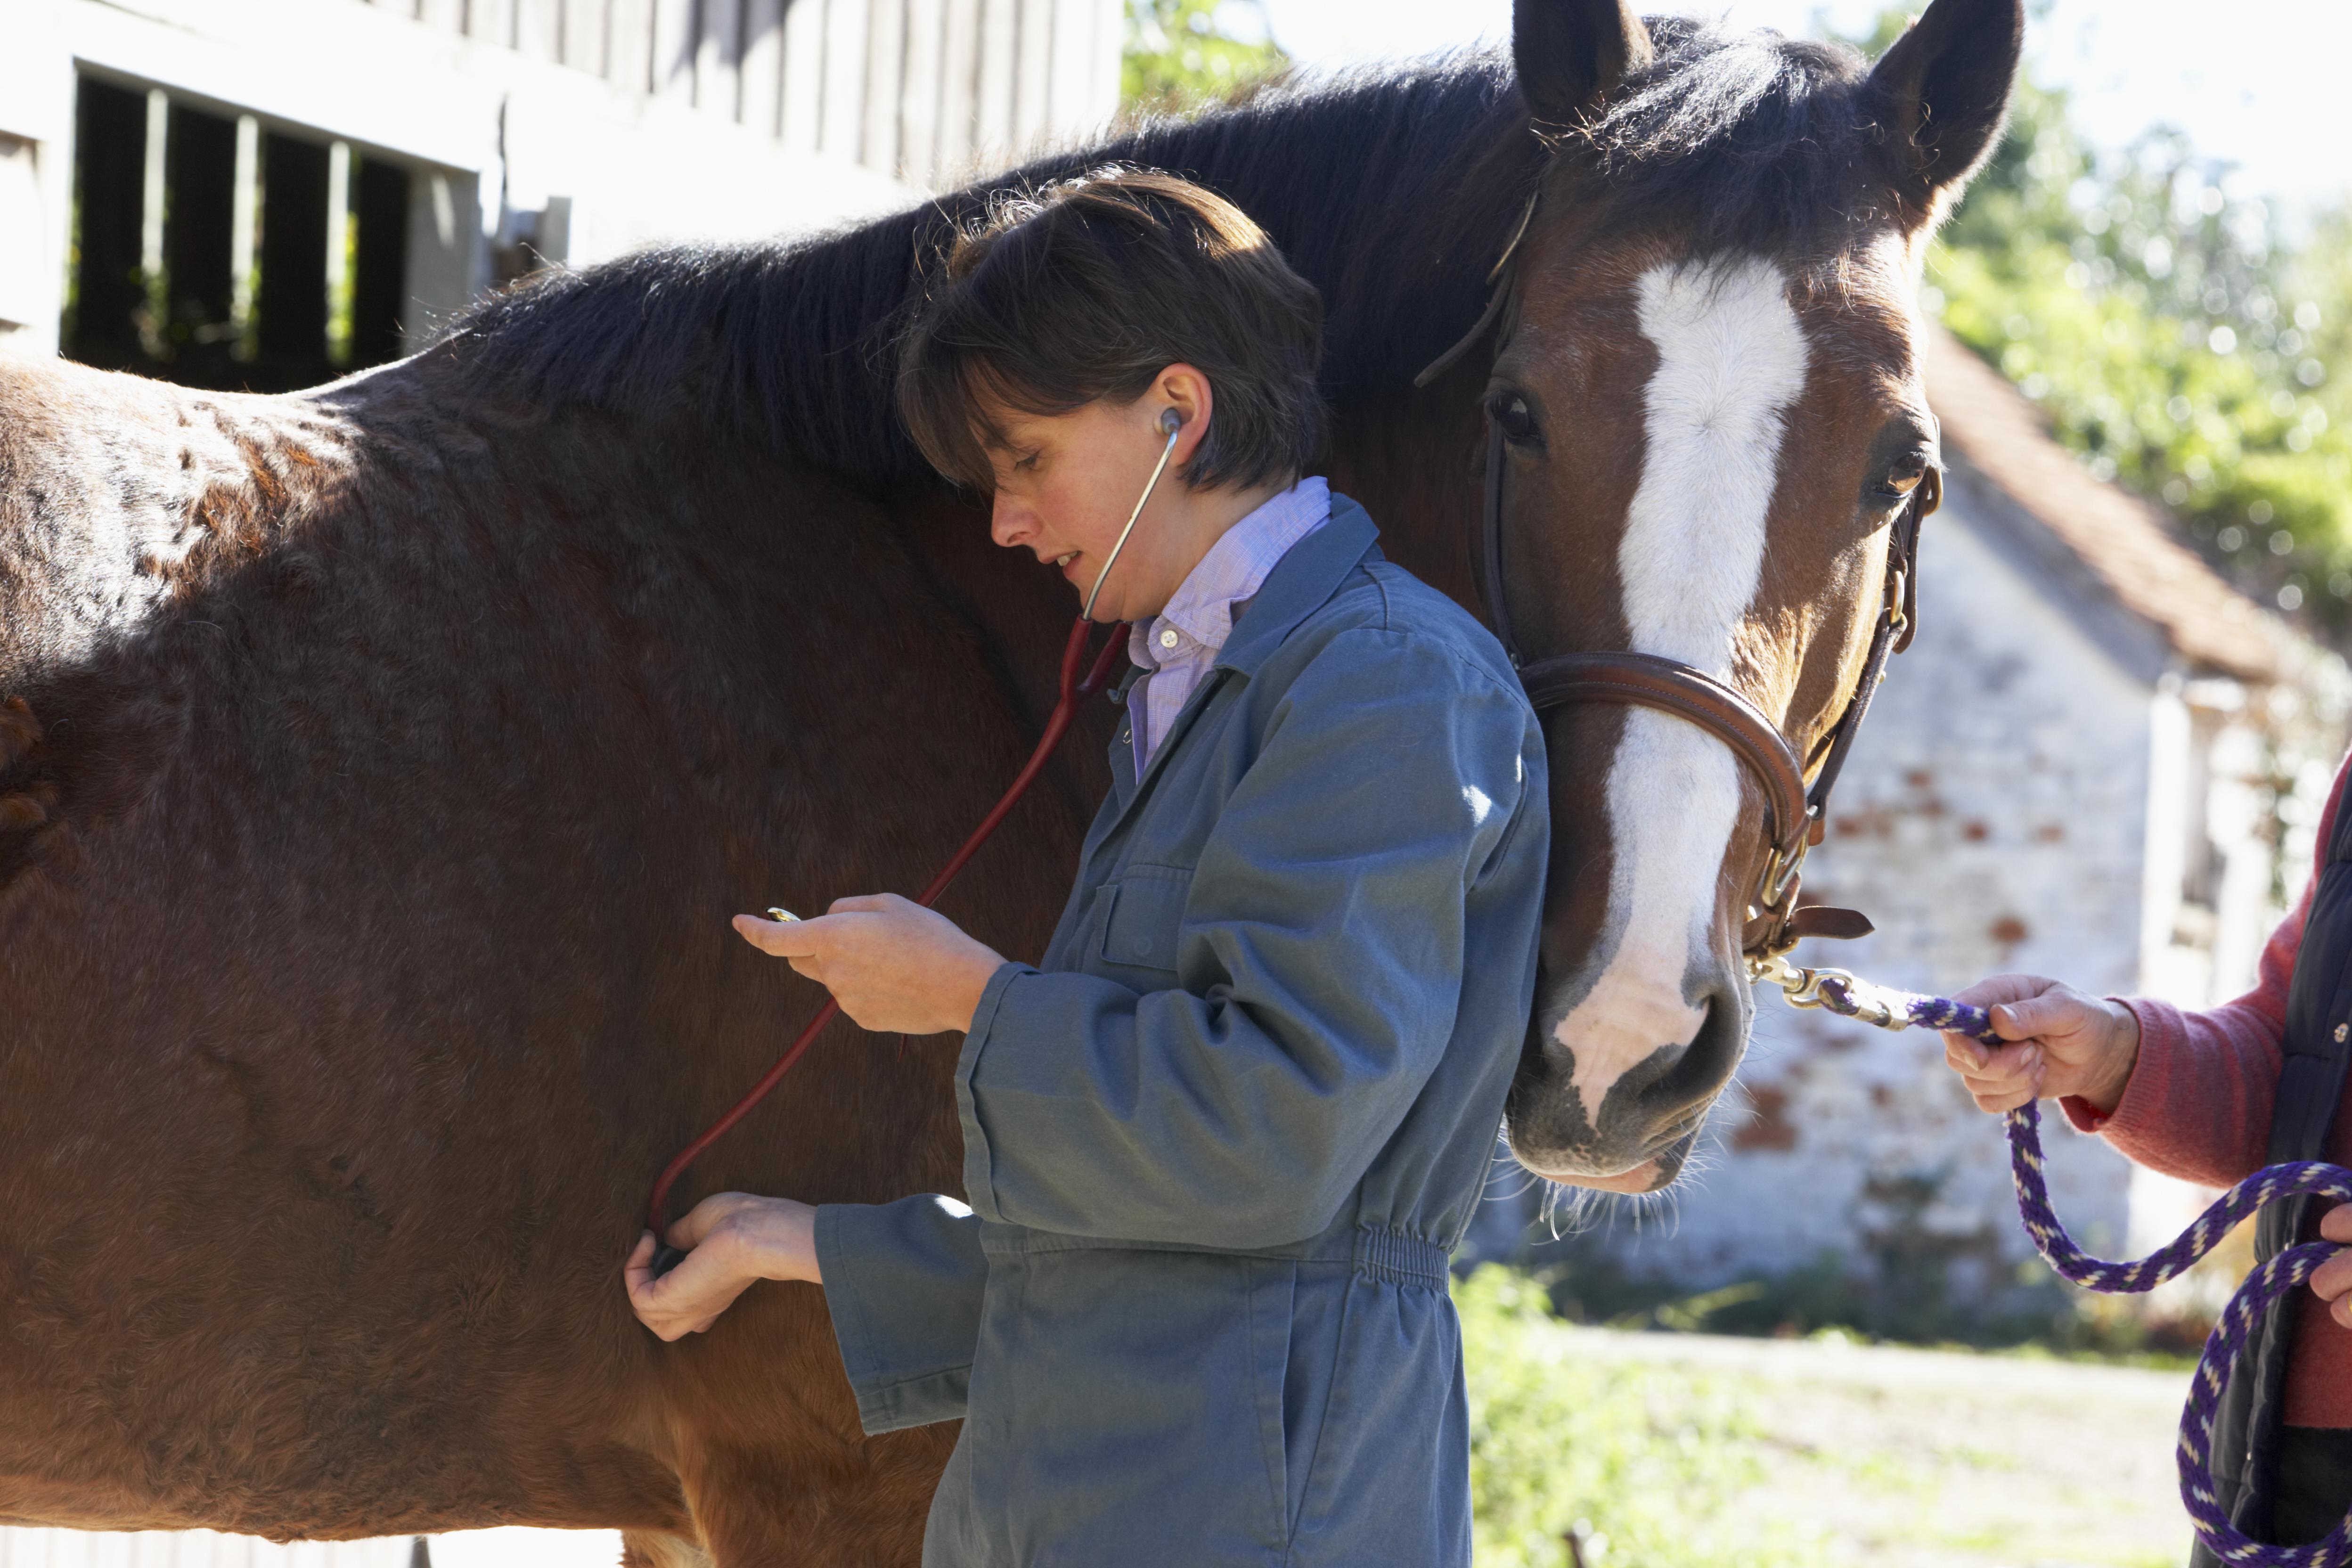 Produtos de desempenho do Kentucky: sinais vitais do seu cavalo 4